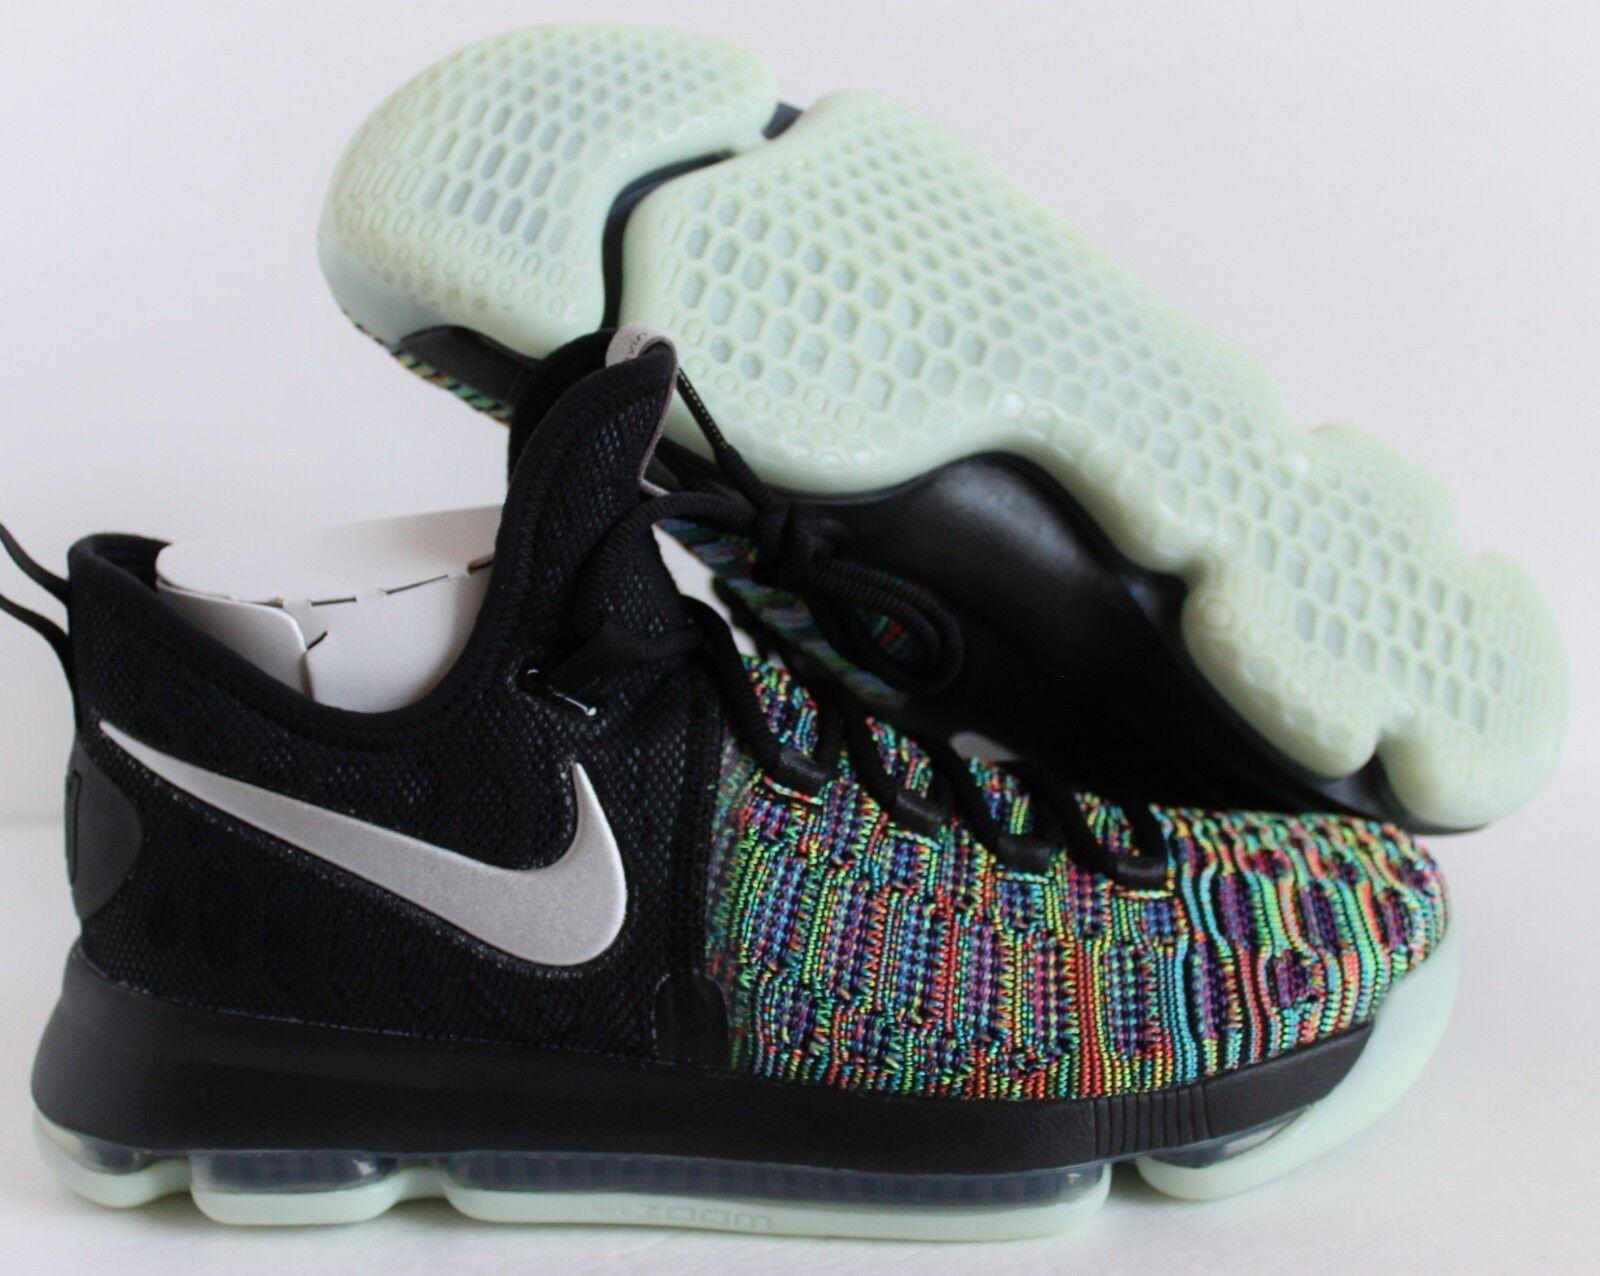 Nike kd 9 ix - multi - farbe / schwarz silber kevin durant sz 9 [863695-999]